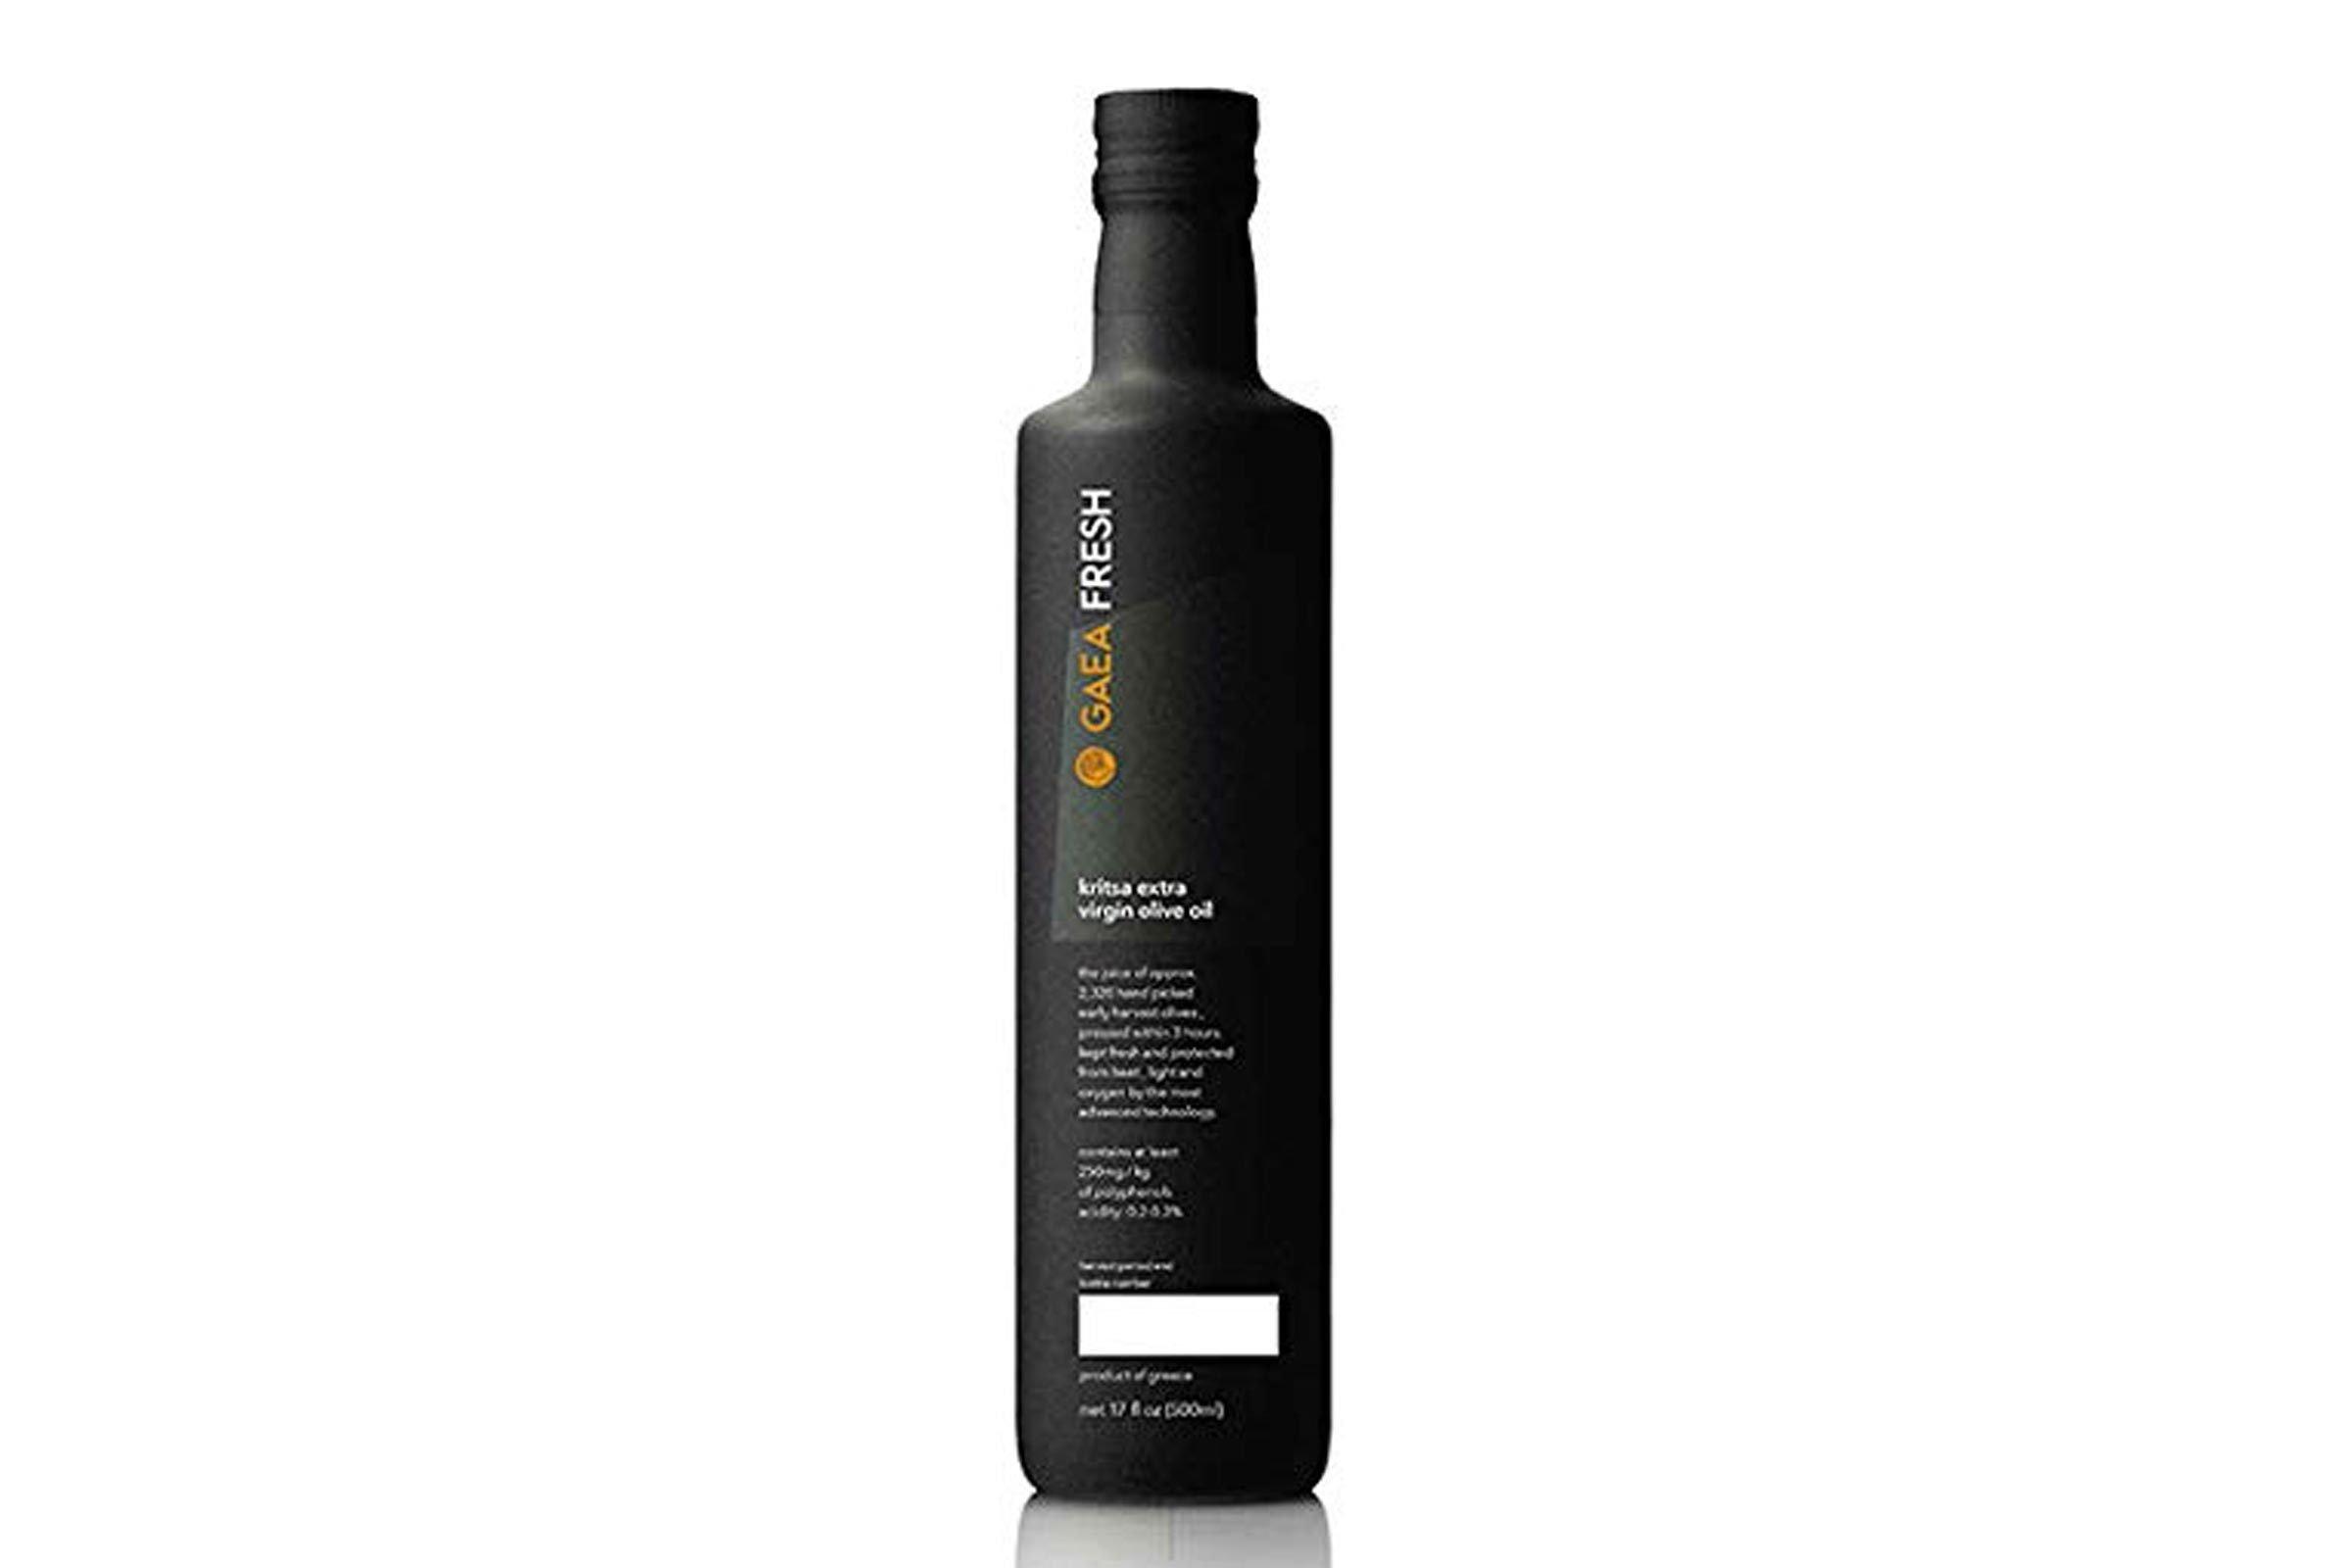 Gaea Fresh Greek Extra Virgin Olive Oil Single Origin EVOO 17 oz. Bottle